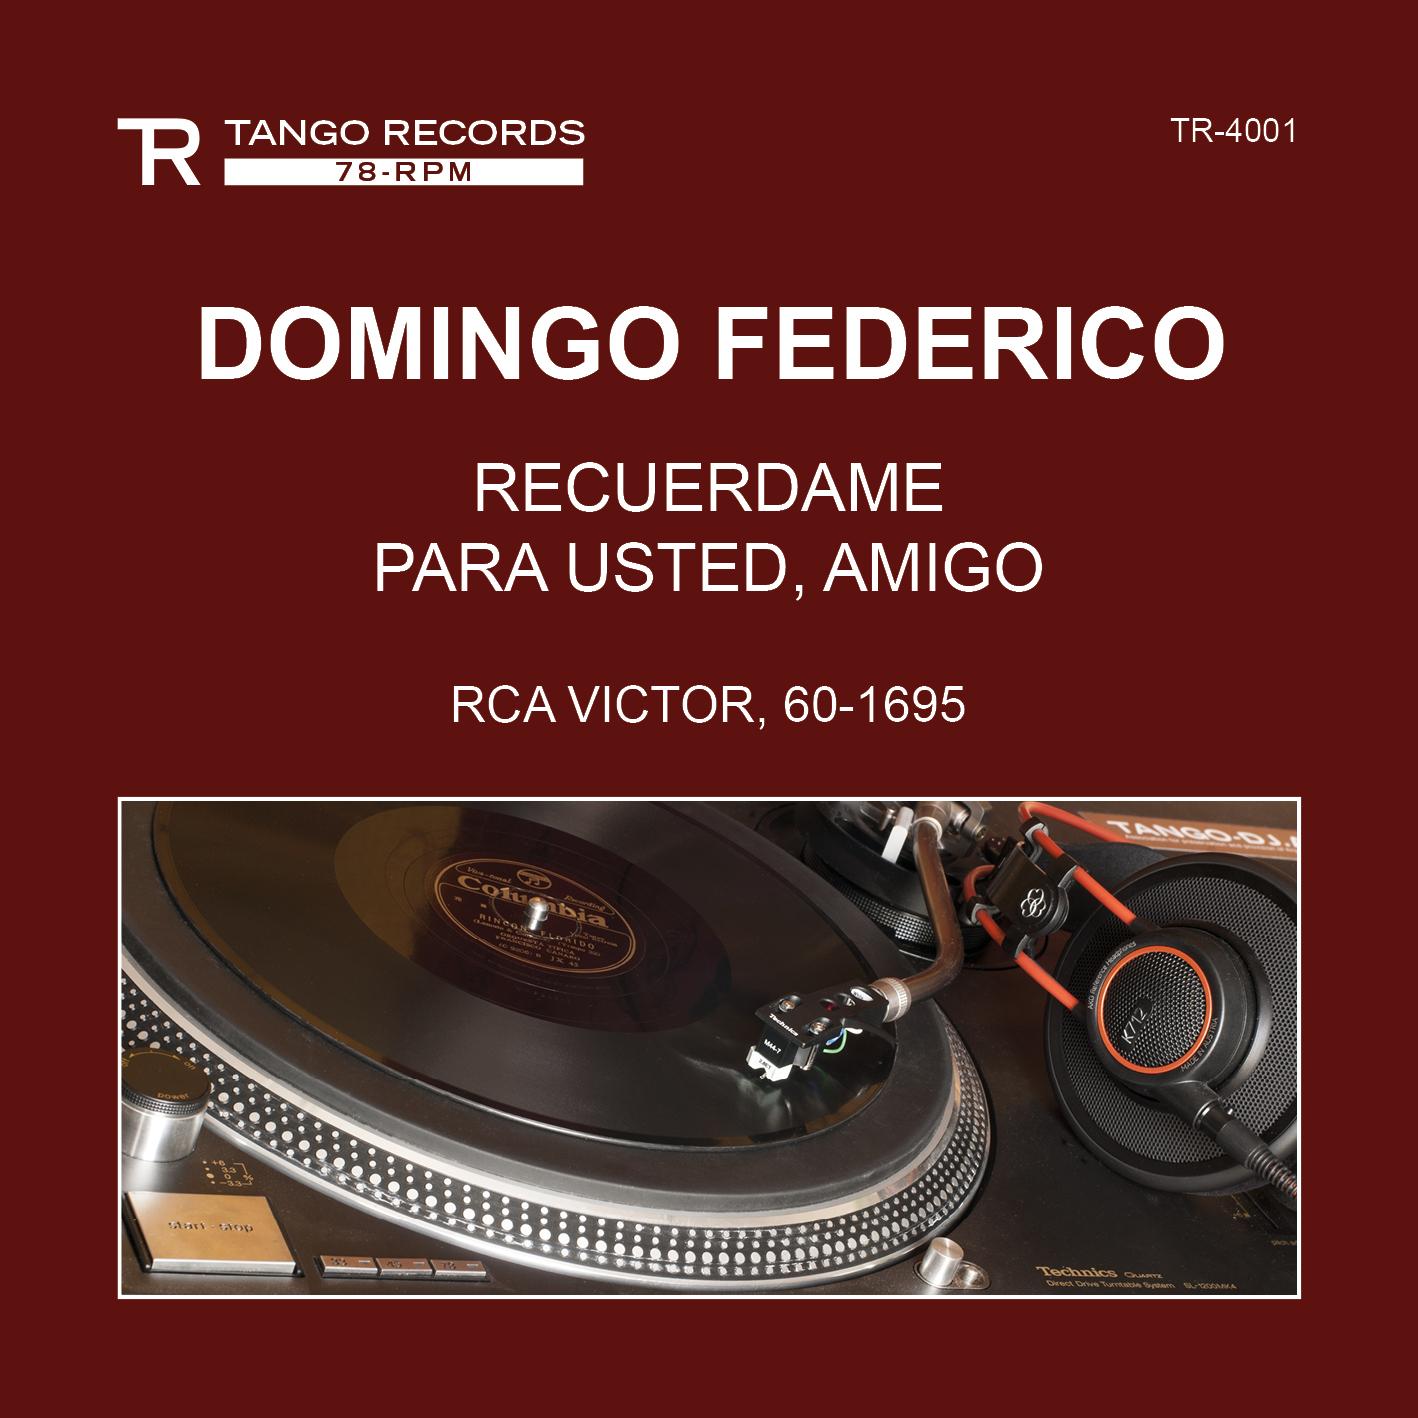 TANGO RECORDS 78-RPM Series Cover